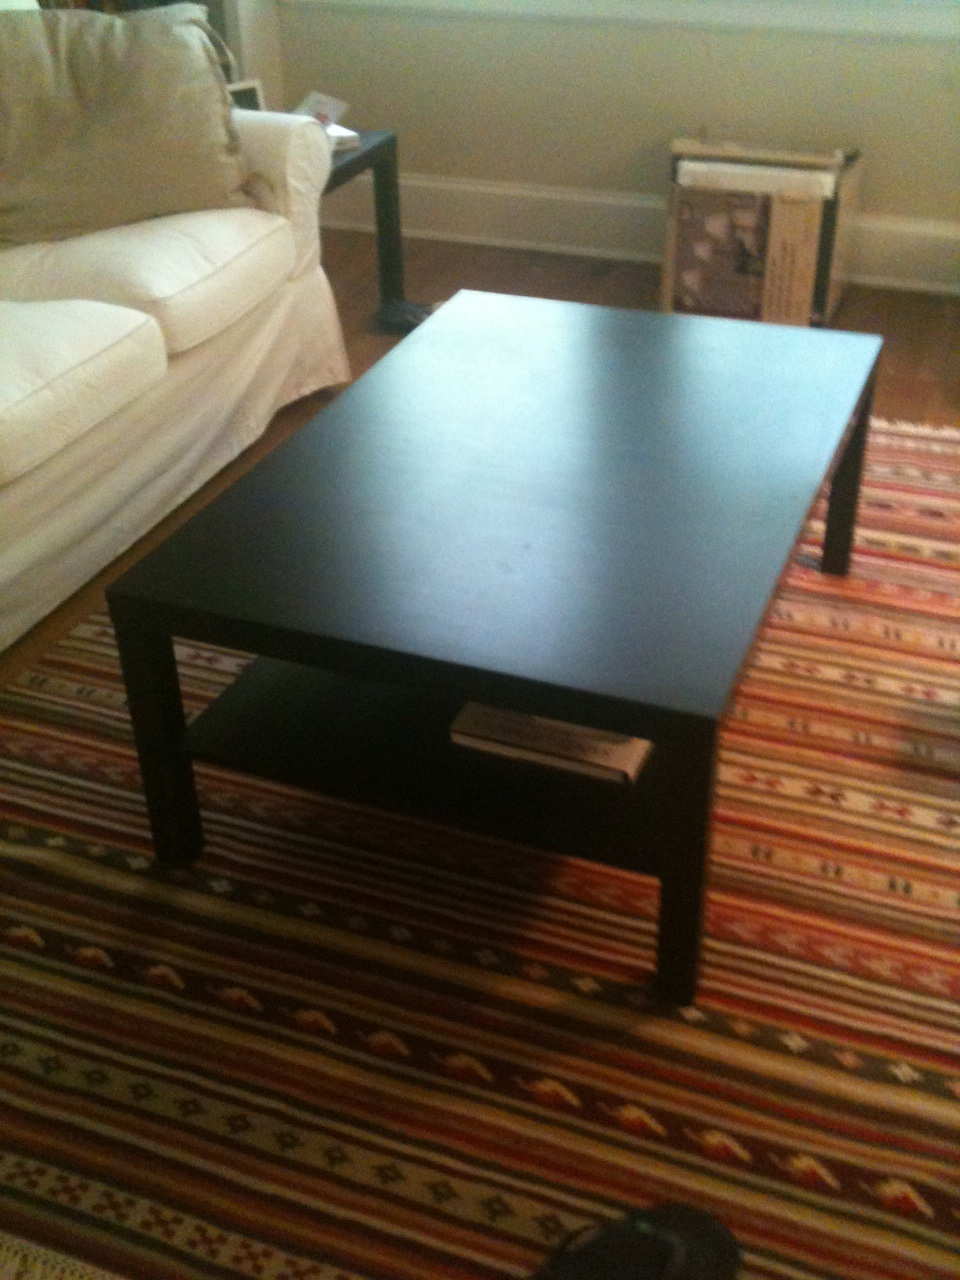 The Feminist Mystique: DIY Rustic Wood Coffee Table/Farm Table